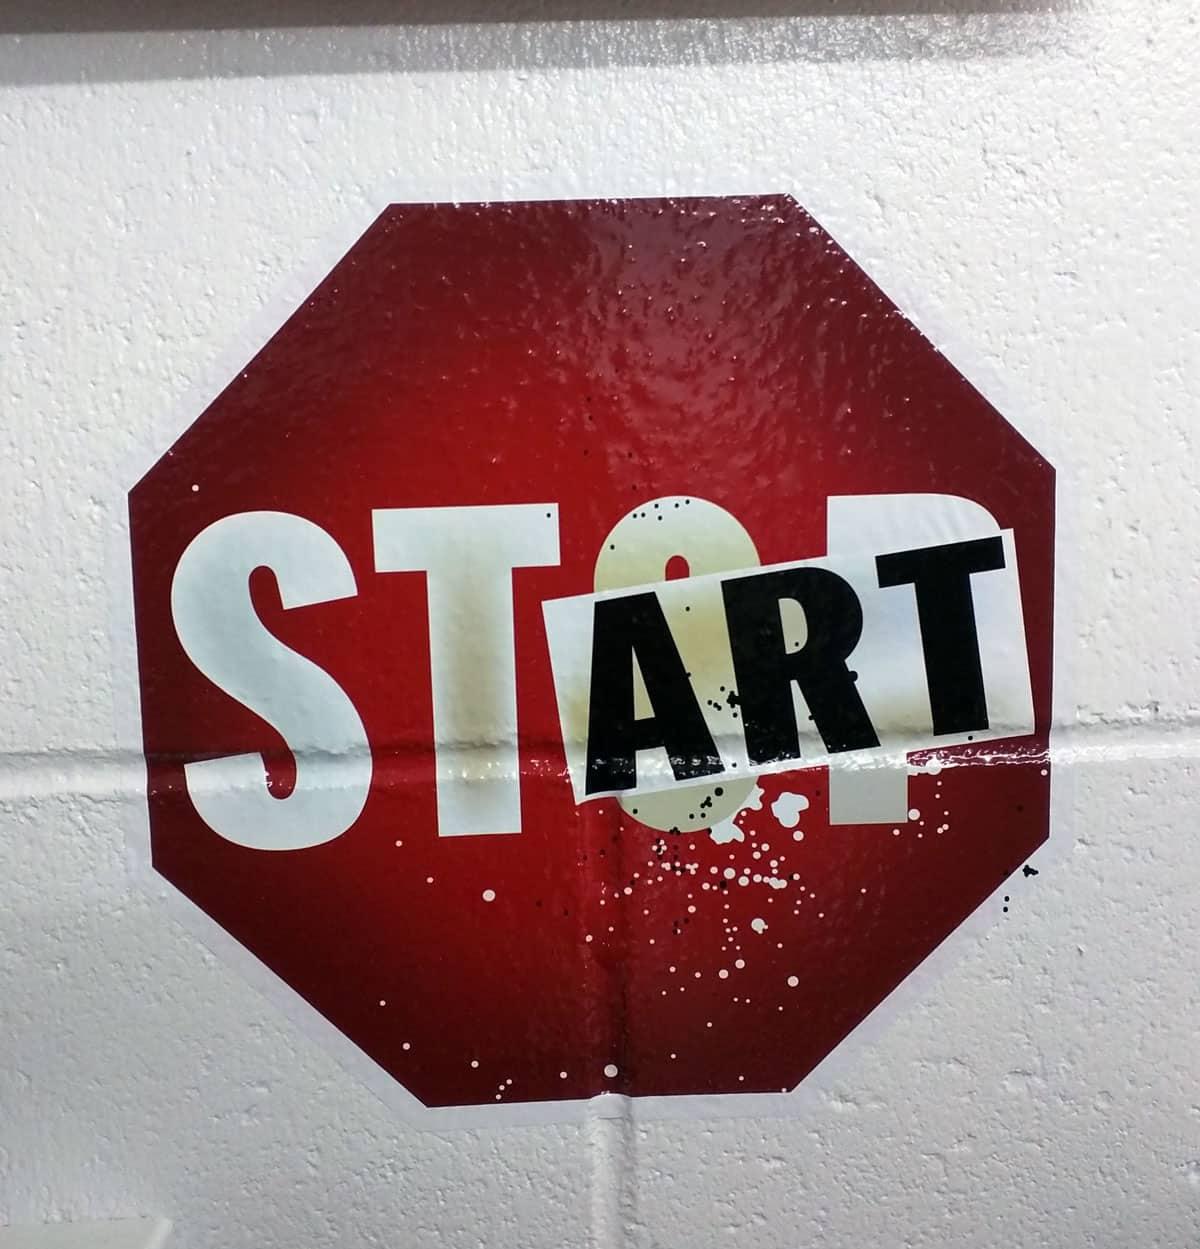 Dont stop just start art vinyl digital custom sticker printed on high adhesive vinyl for brick concreate and plastic